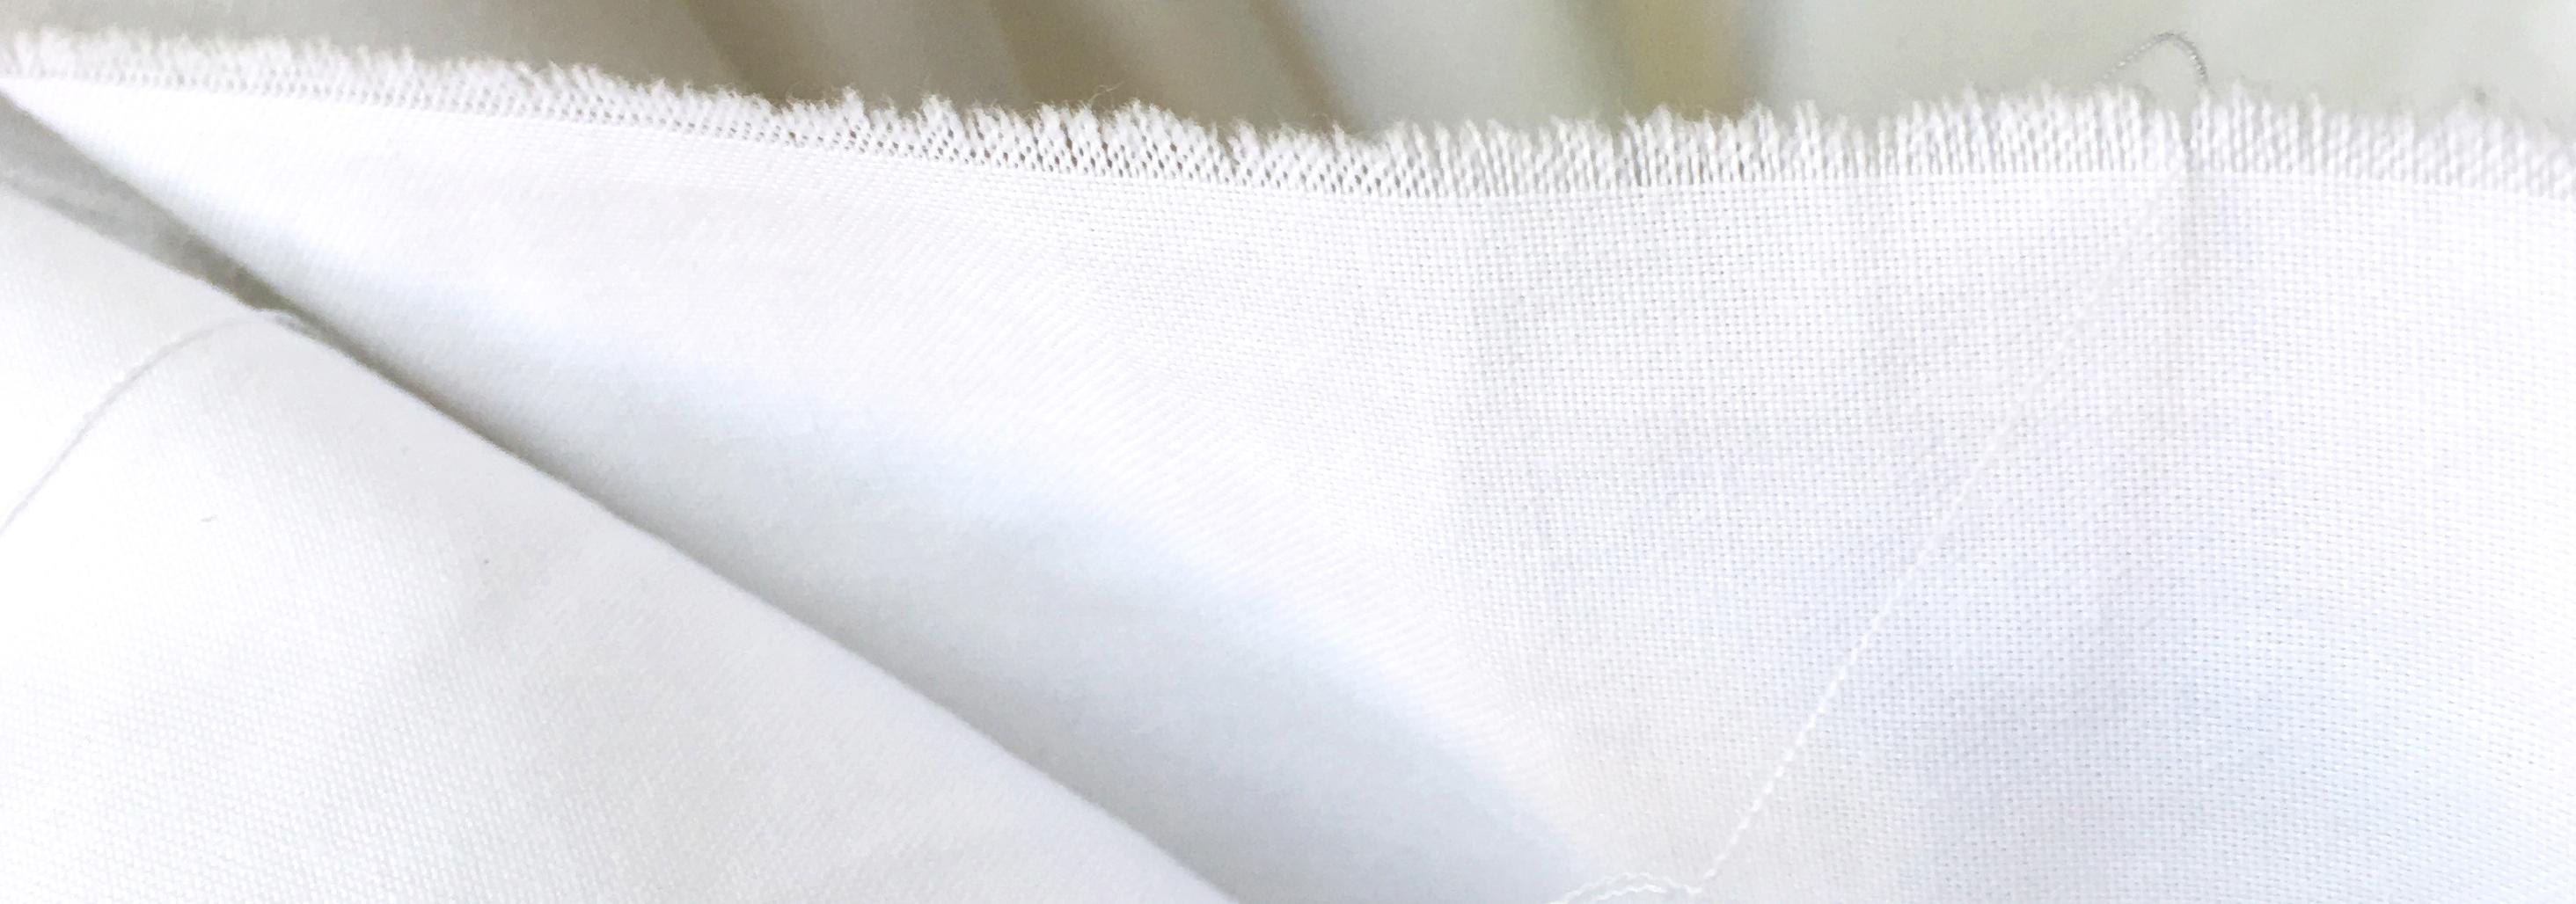 micro tejido trapo sabana